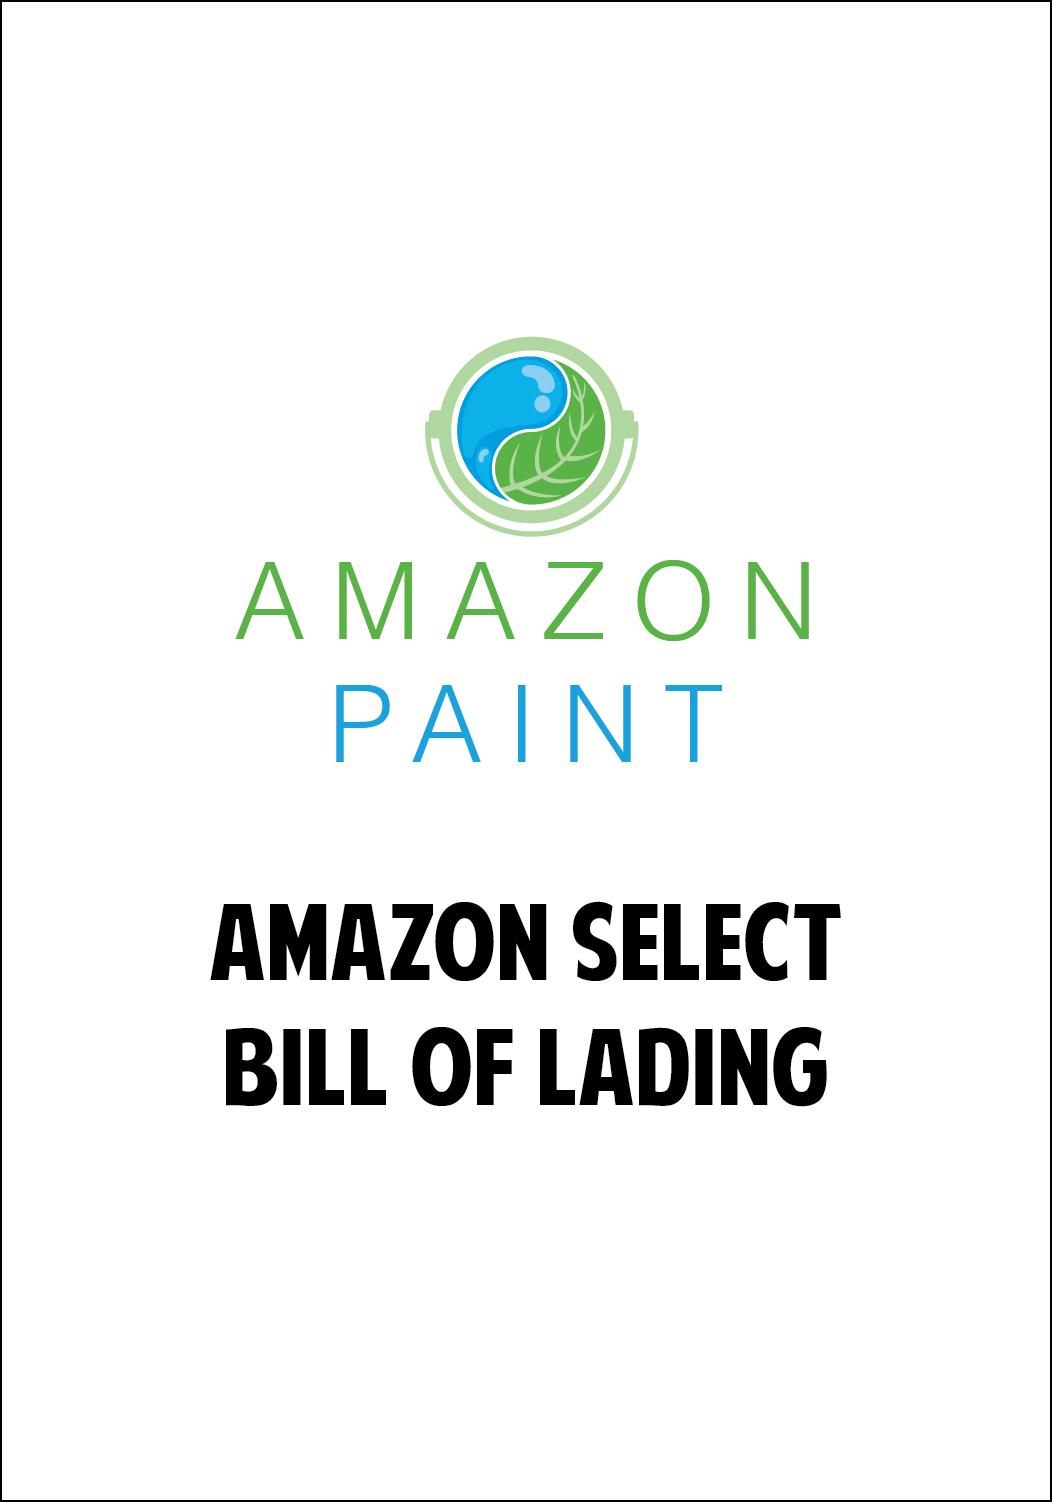 Amazon Select Bill of Lading